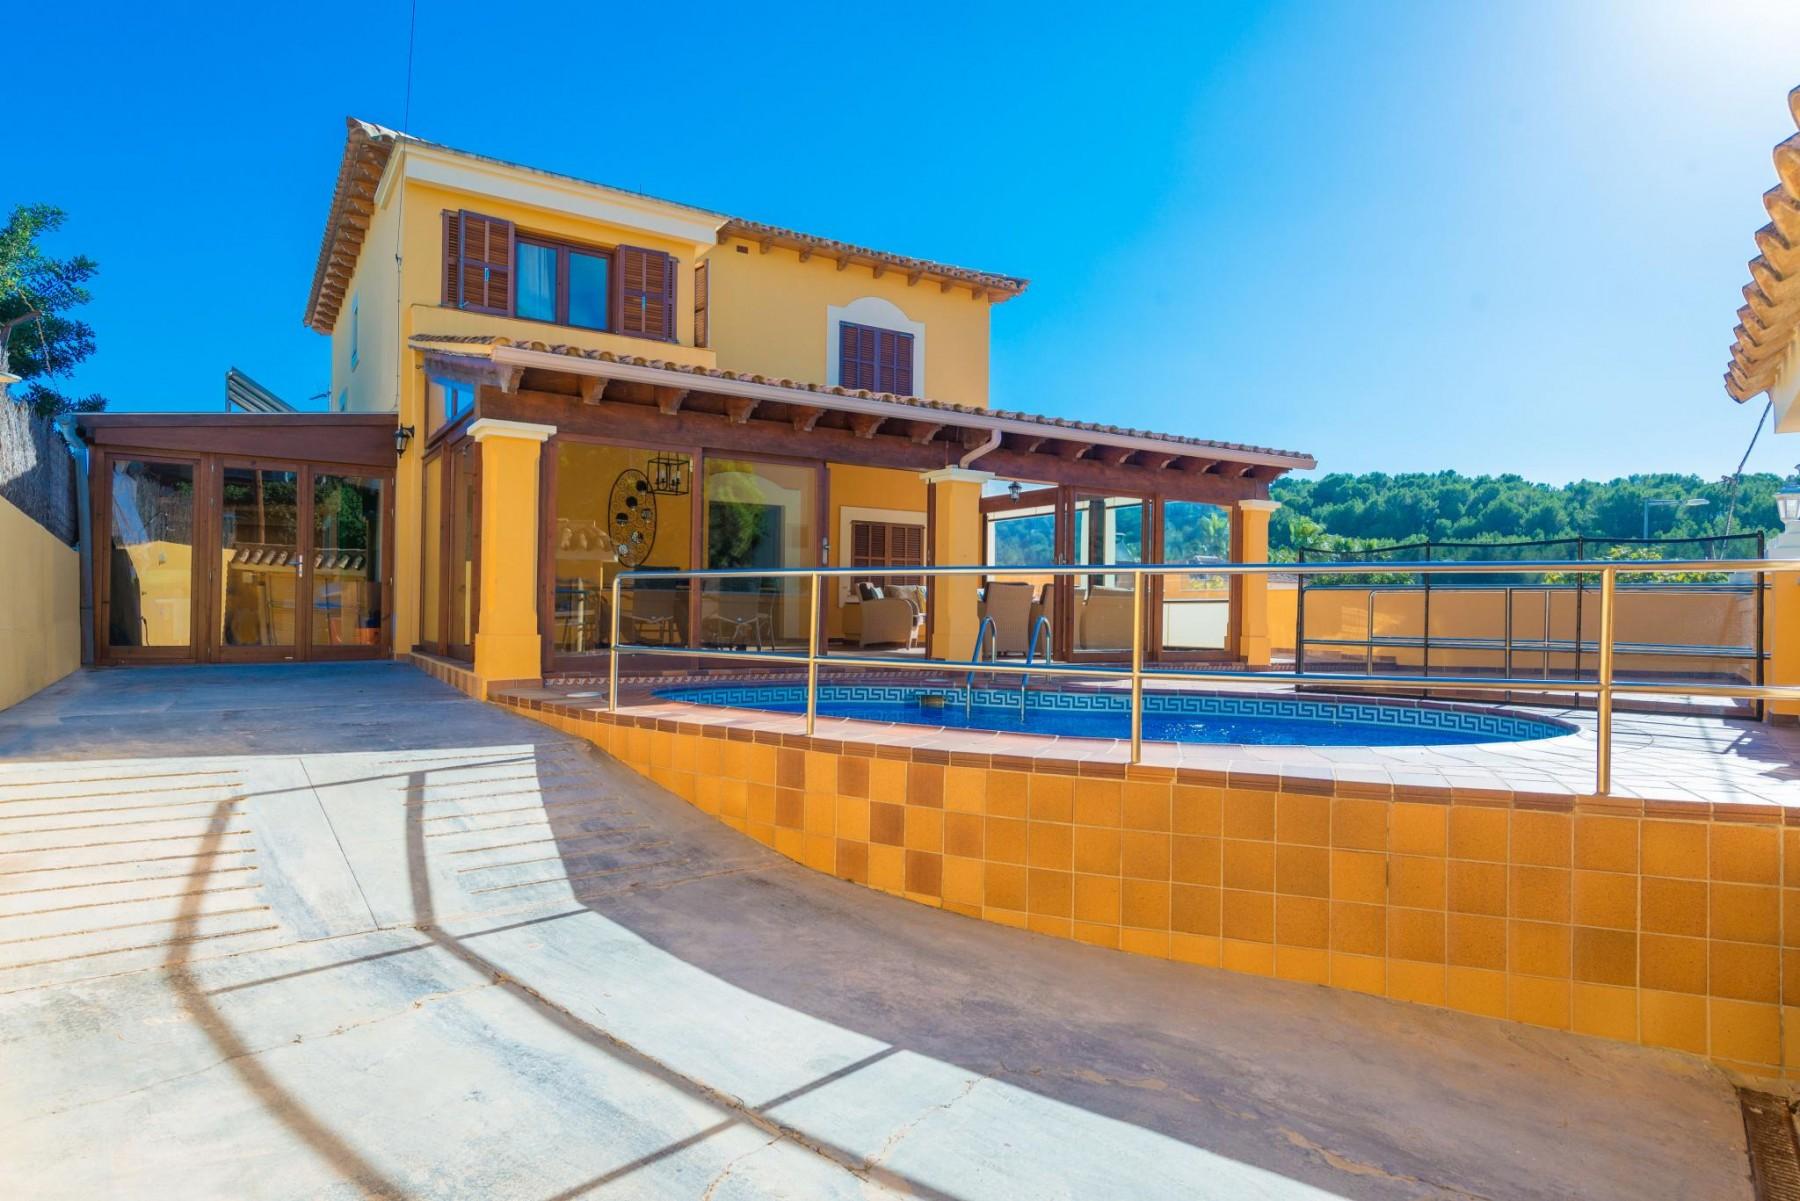 CASA LOLI for 10 guests in Calvia, Spain